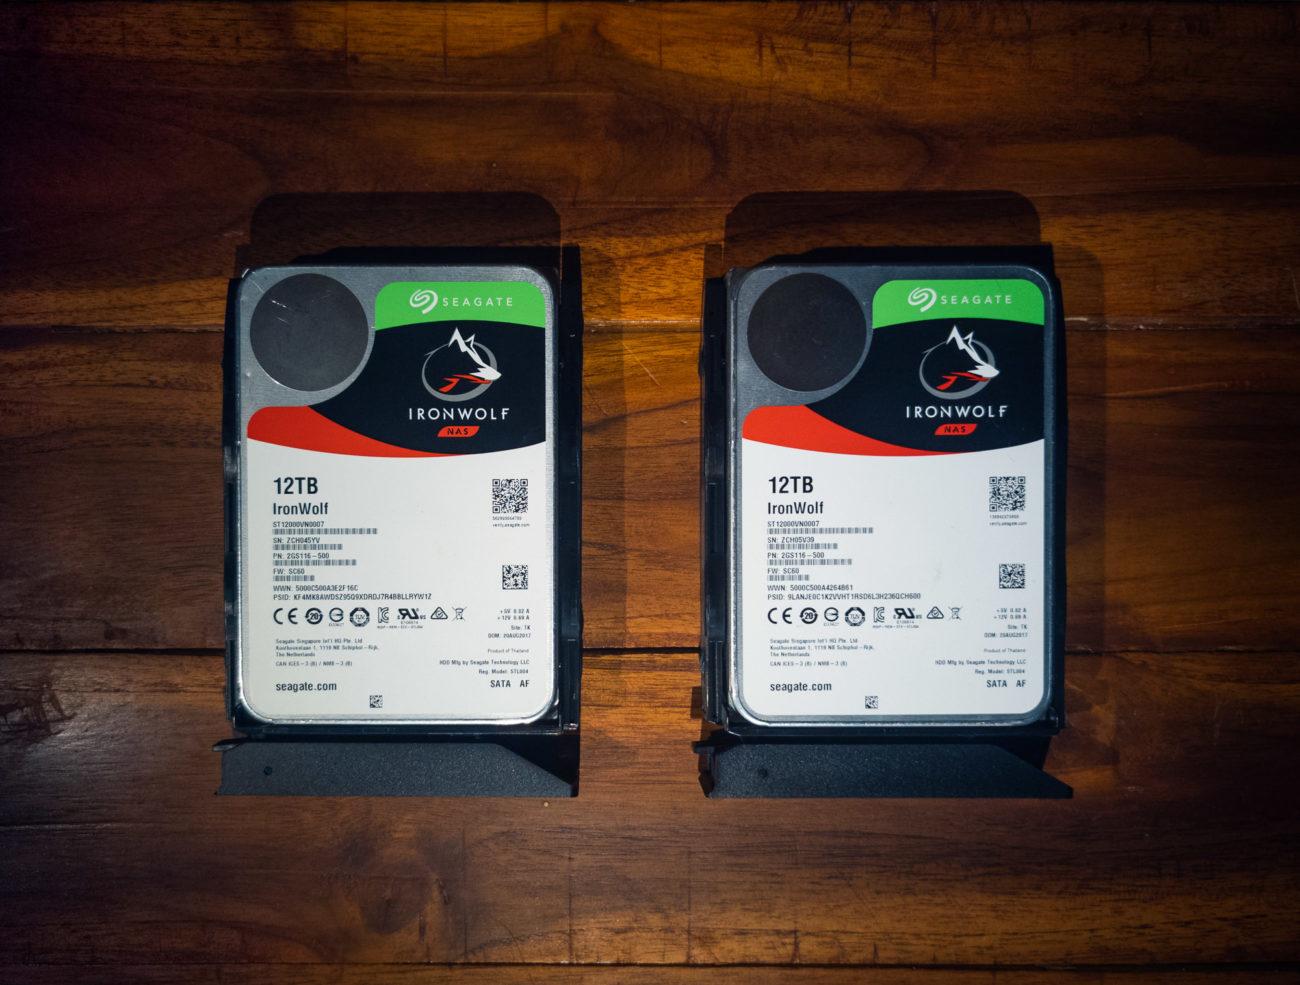 Synology NAS Seagate hard drives.